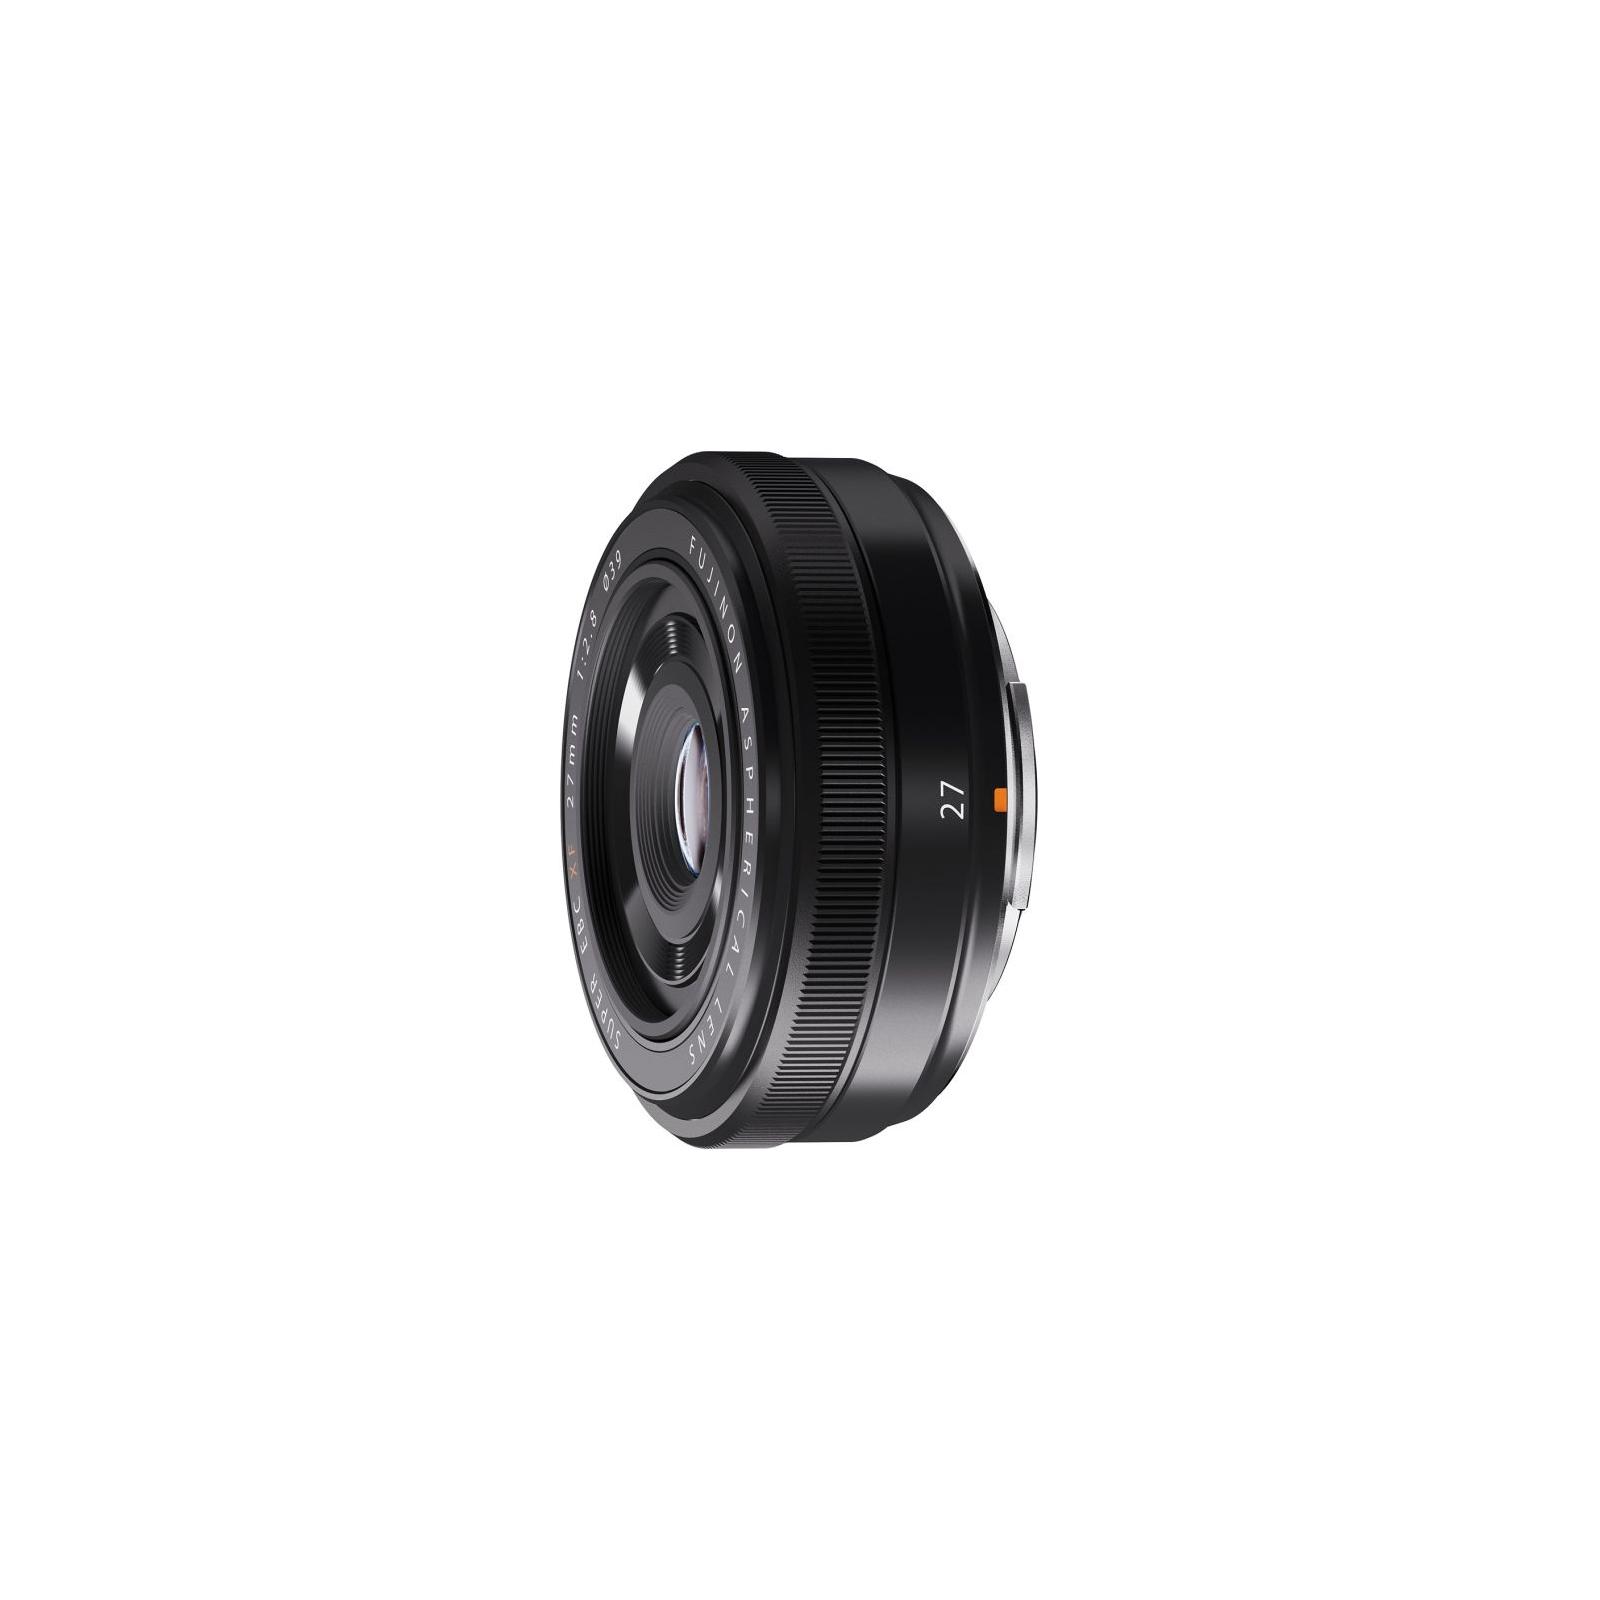 Объектив Fujifilm XF-27mm F2.8 (16389123) изображение 3